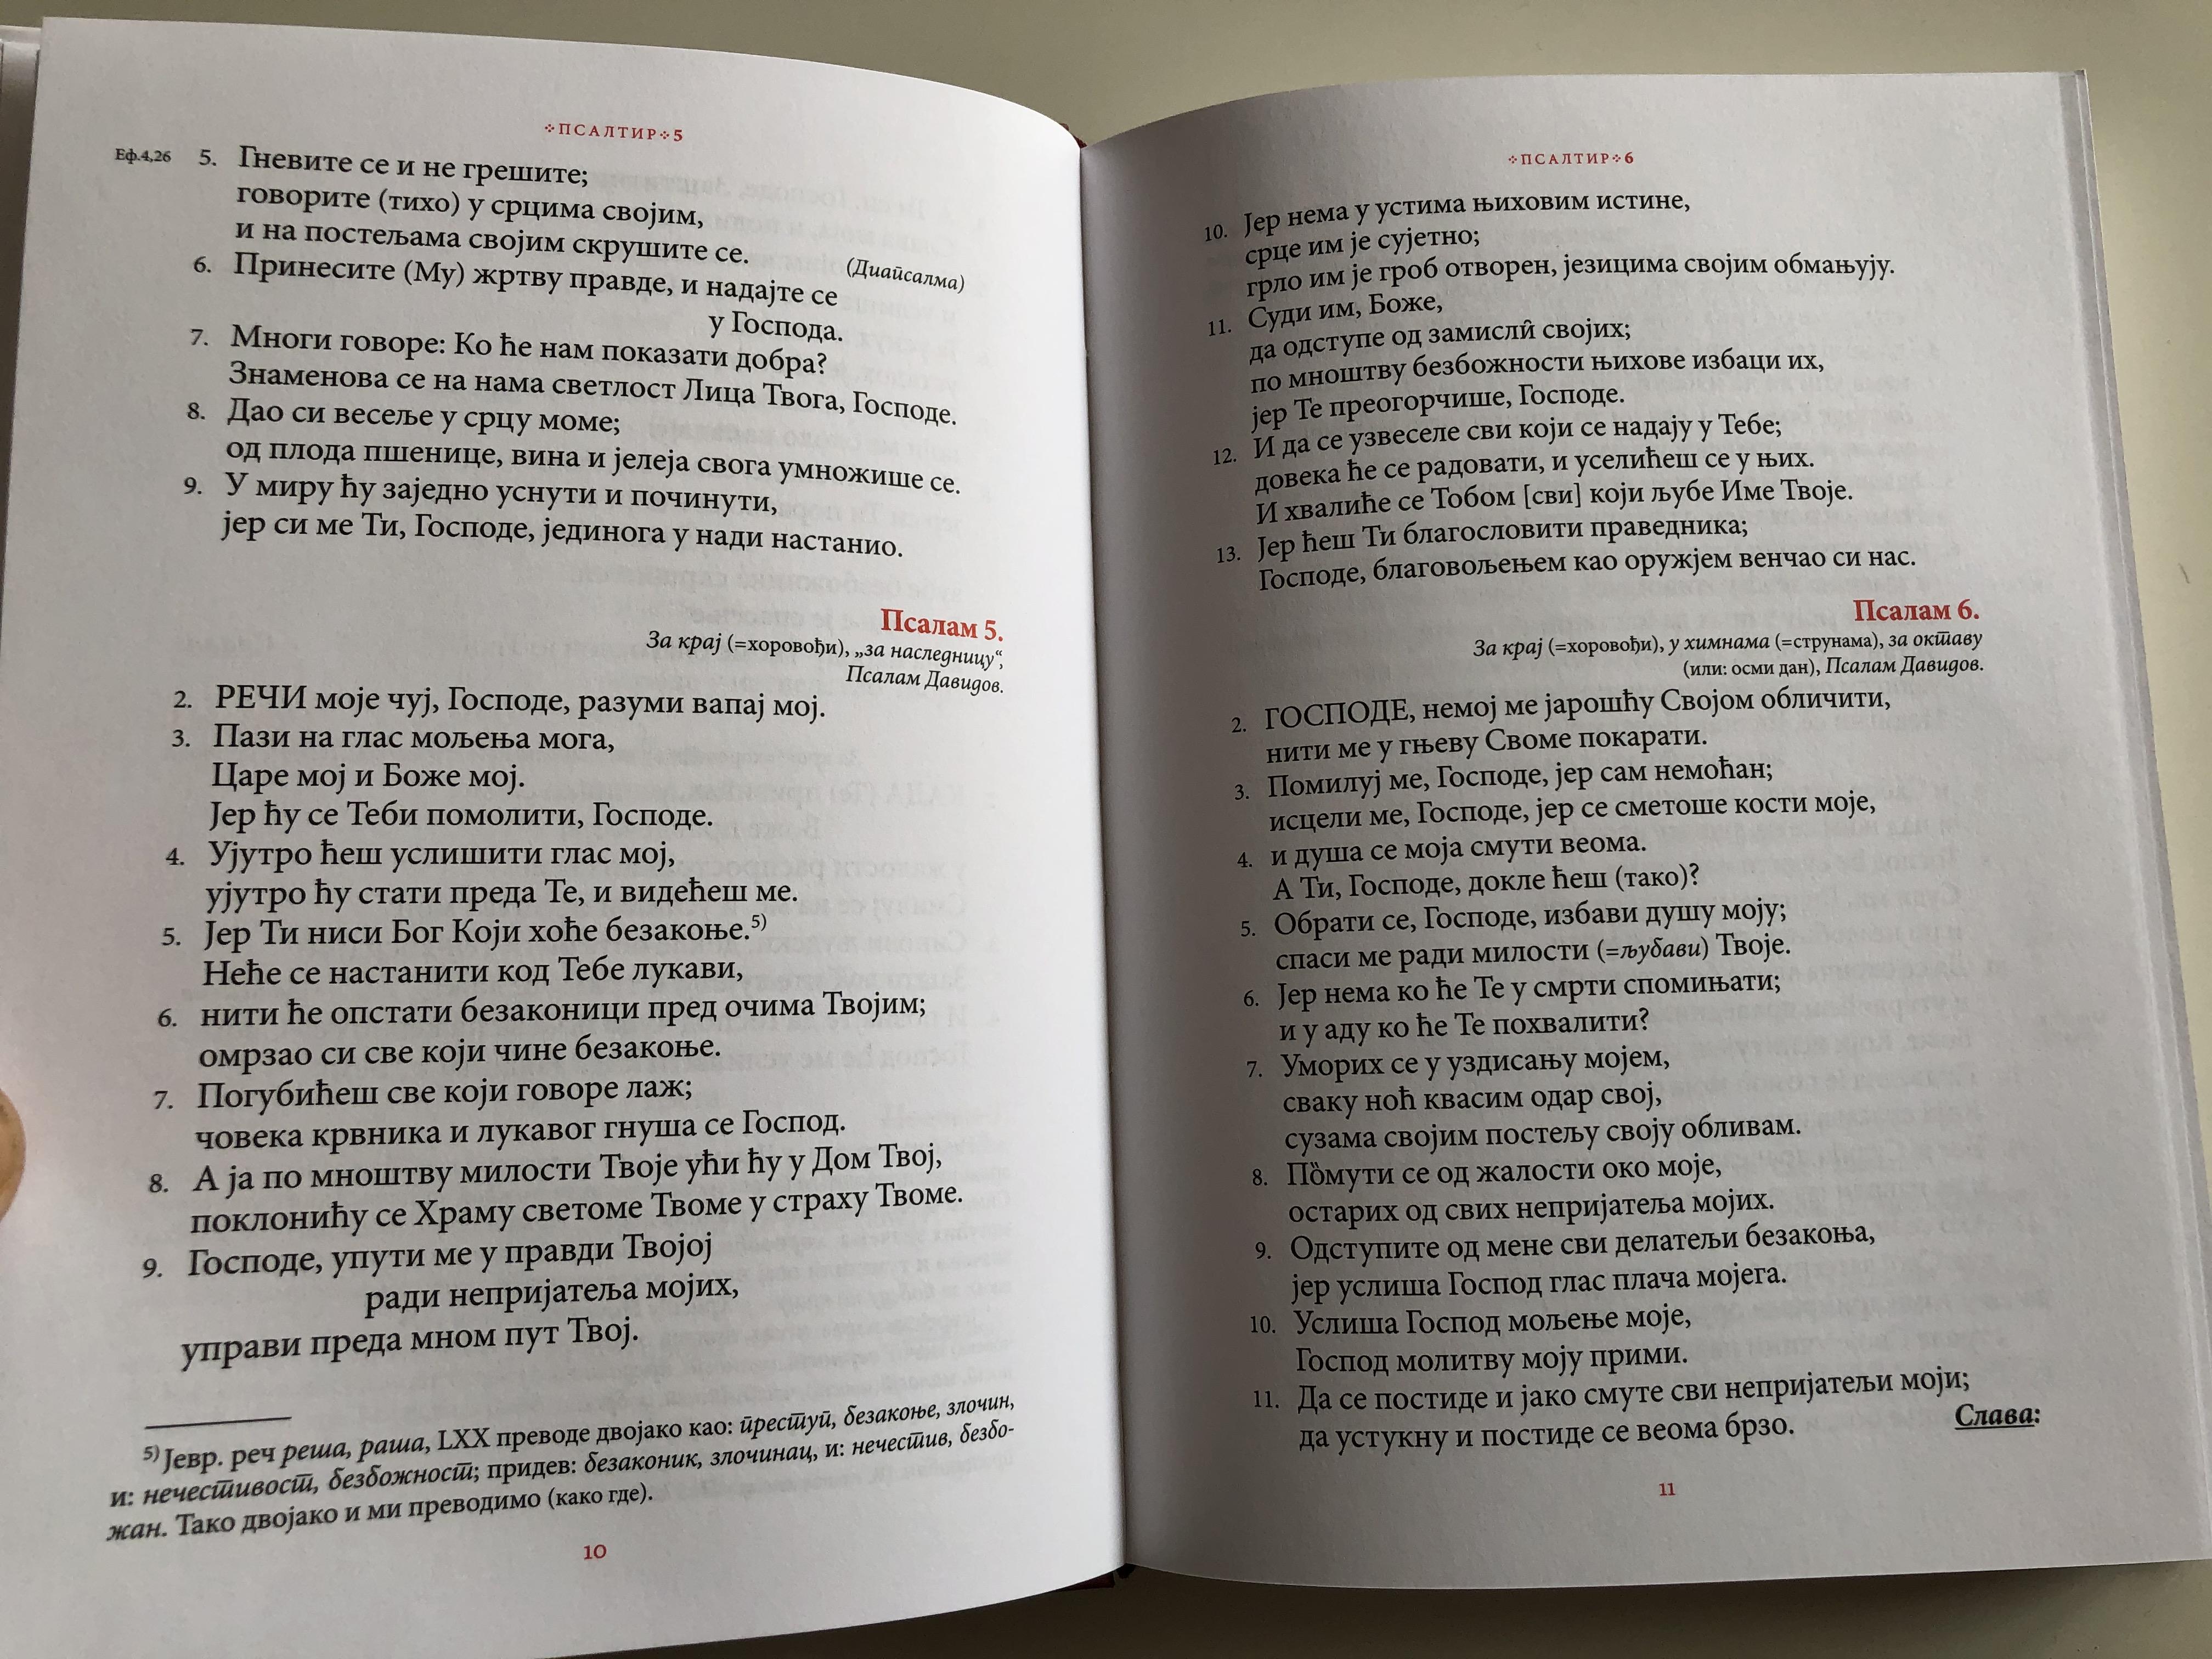 serbian-psalm-book-with-9-biblical-songs-6-.jpg